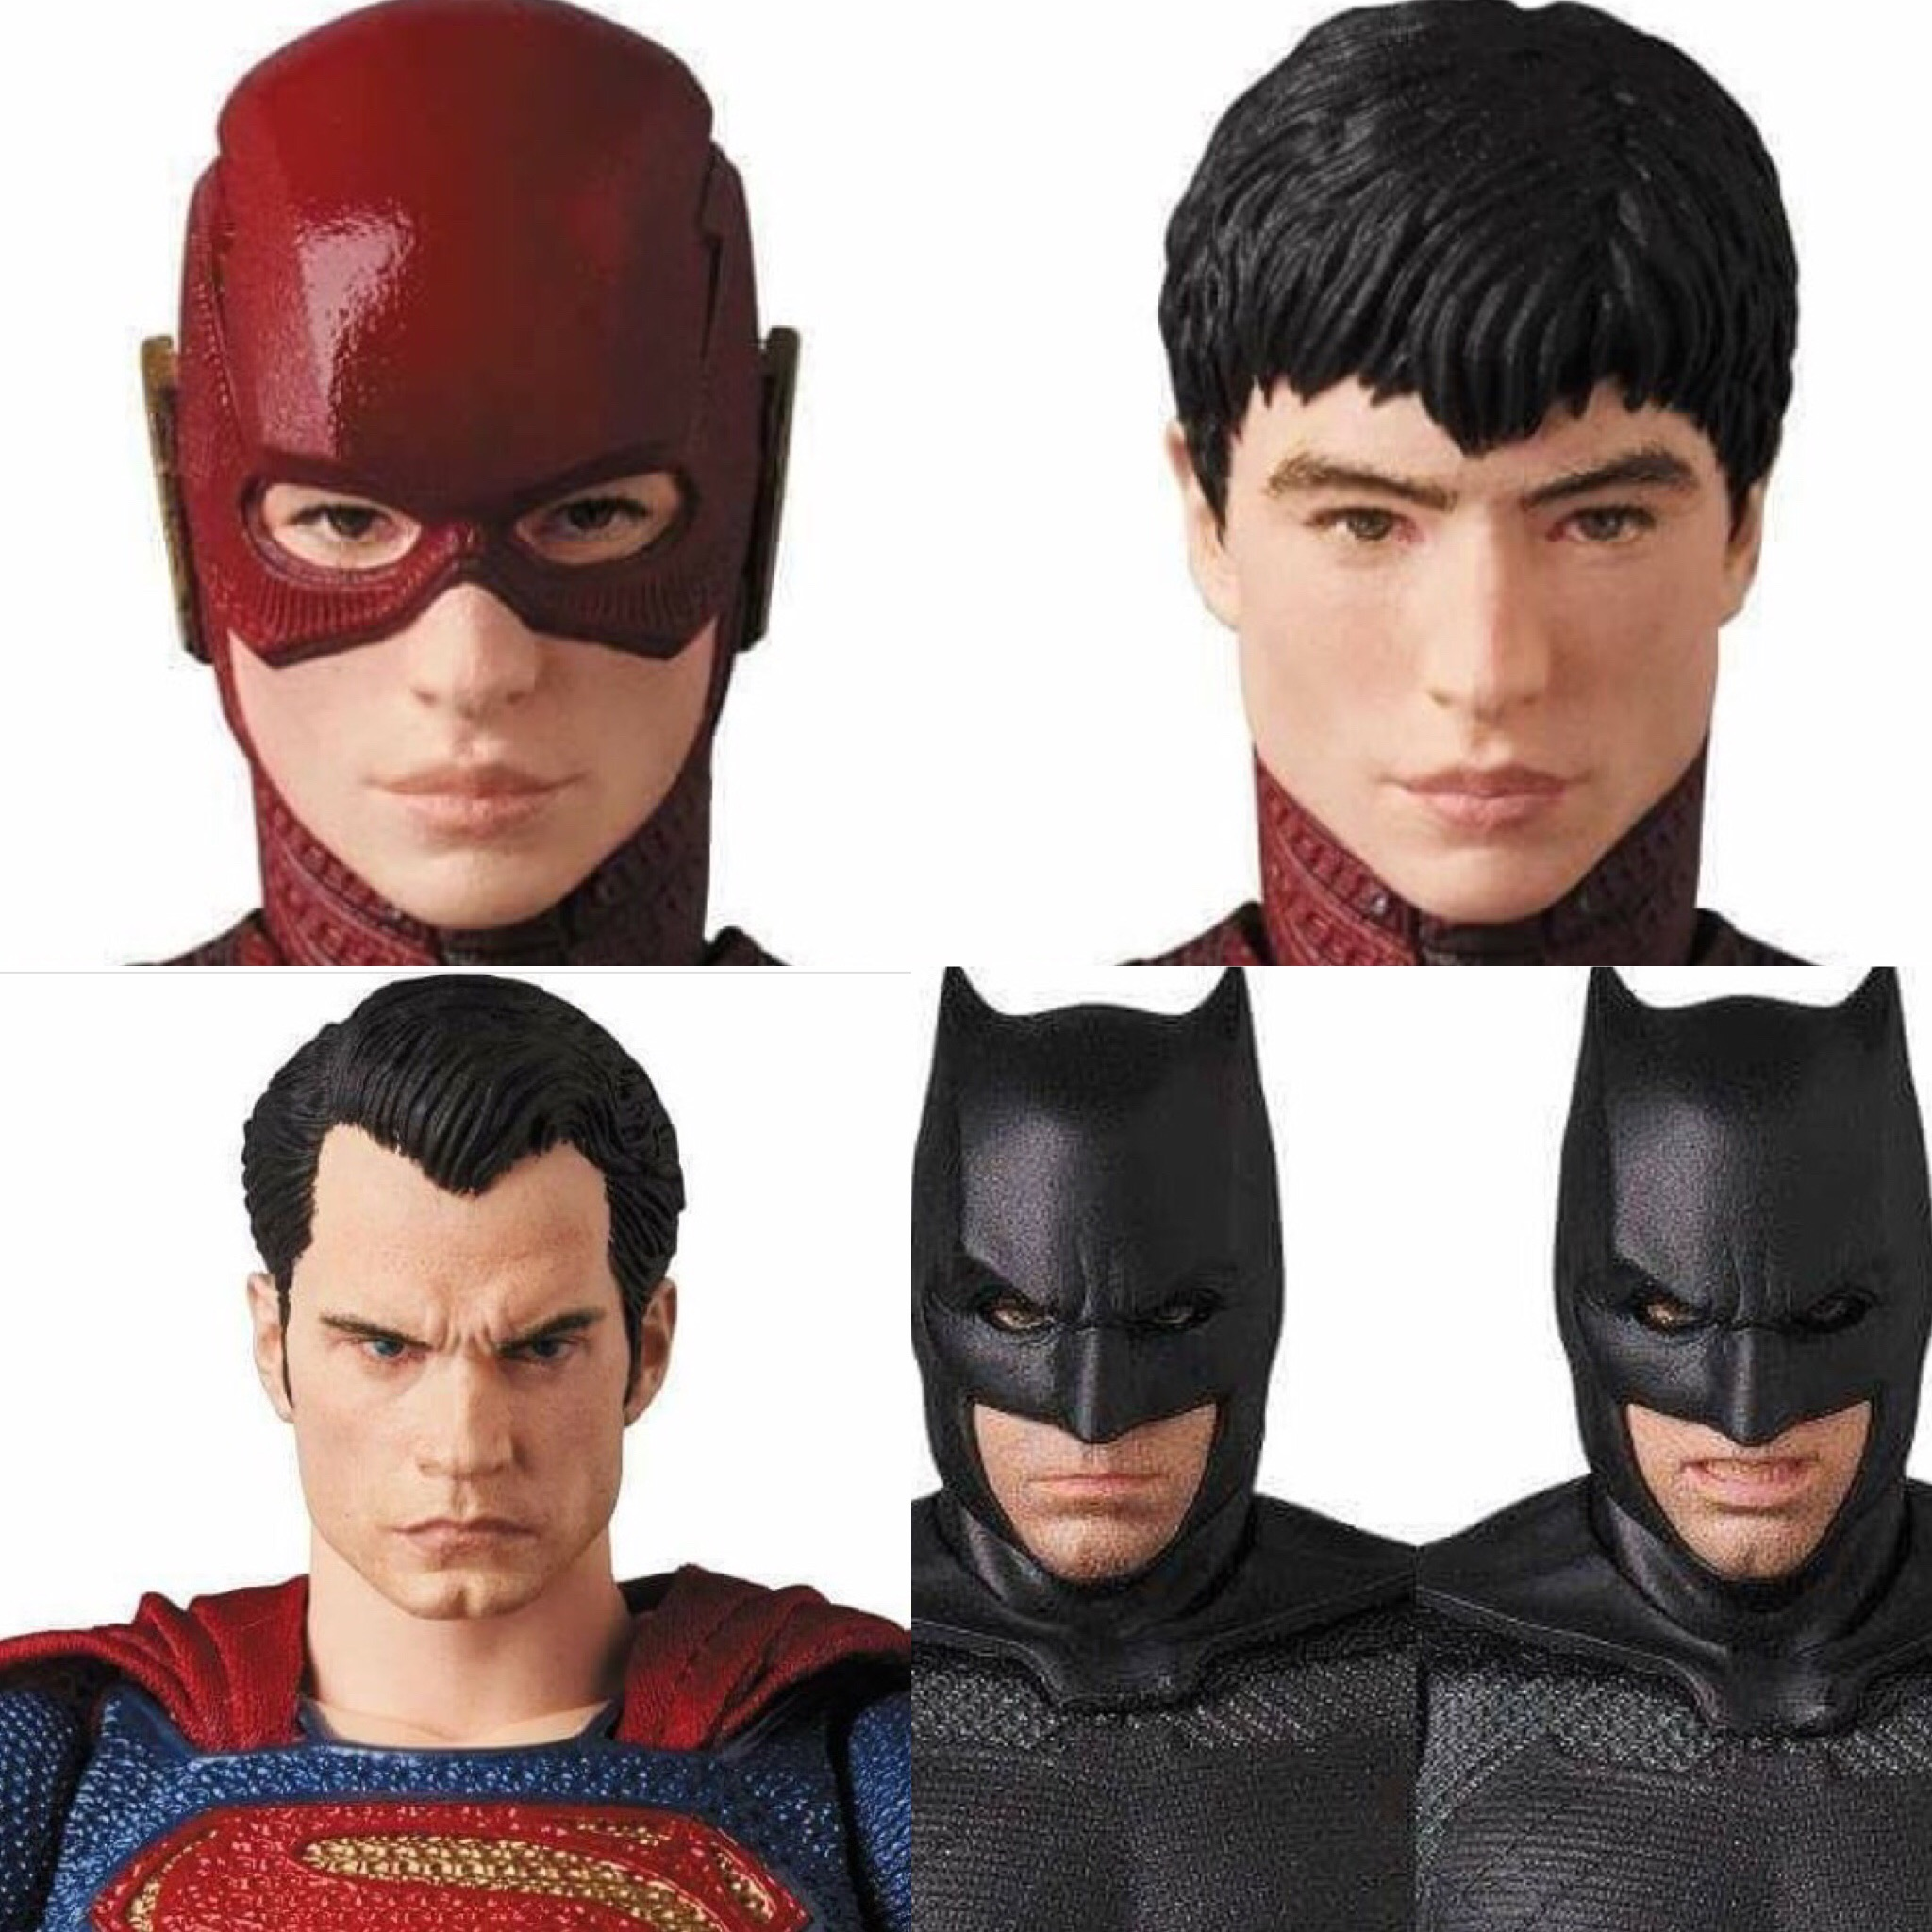 MAFEX新作!『ジャスティスリーグ』からフラッシュ、スーパーマン、バットマンの画像公開!